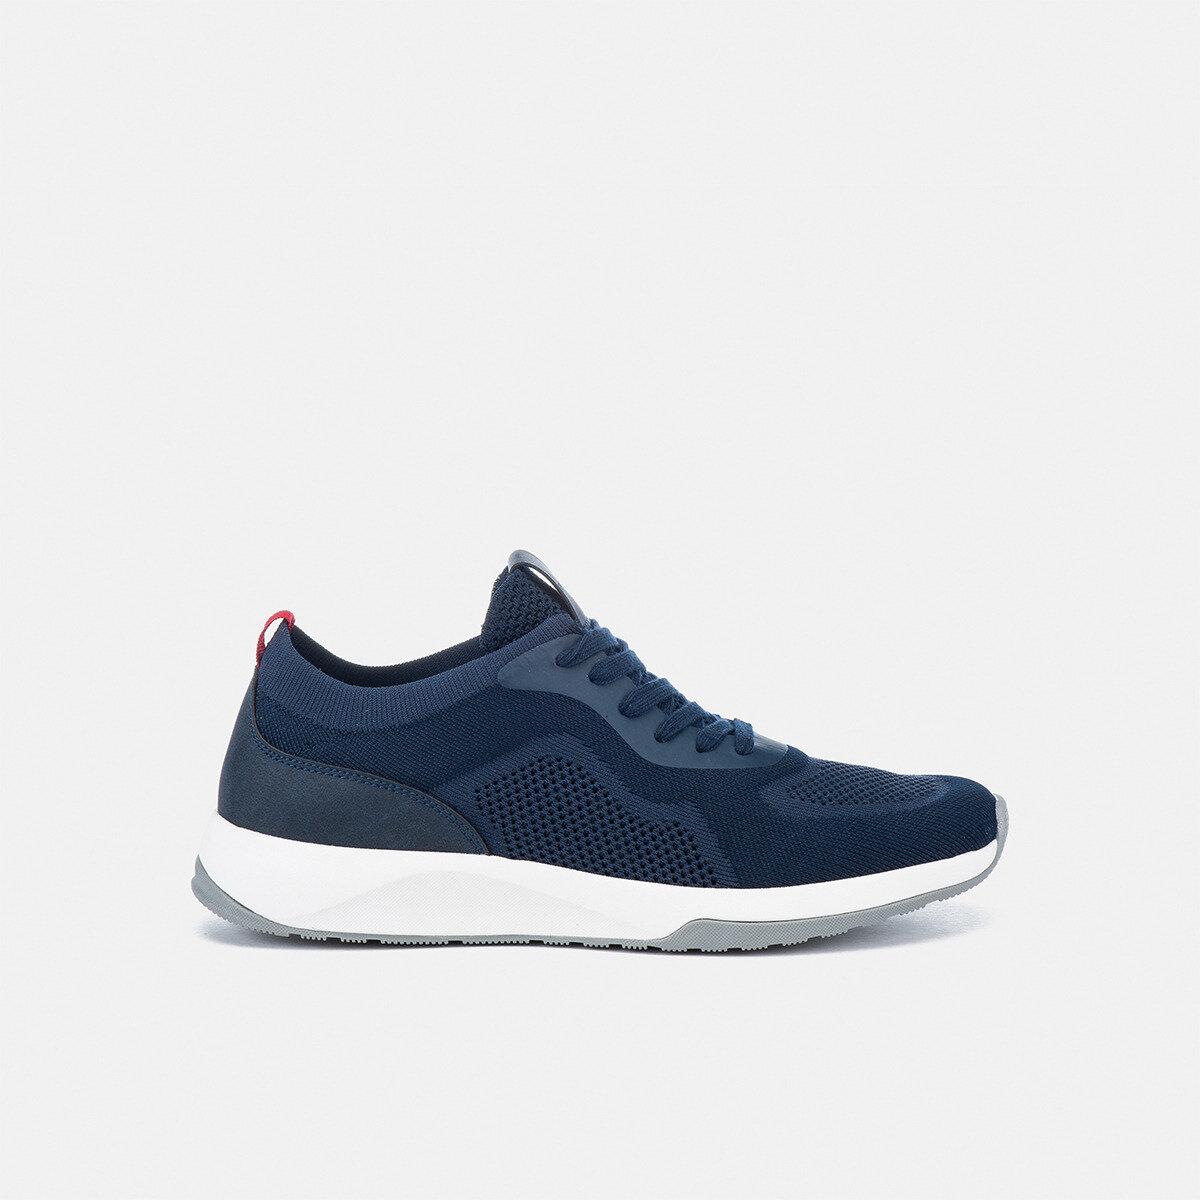 NANTES NAVY BLUE Man Sneakers